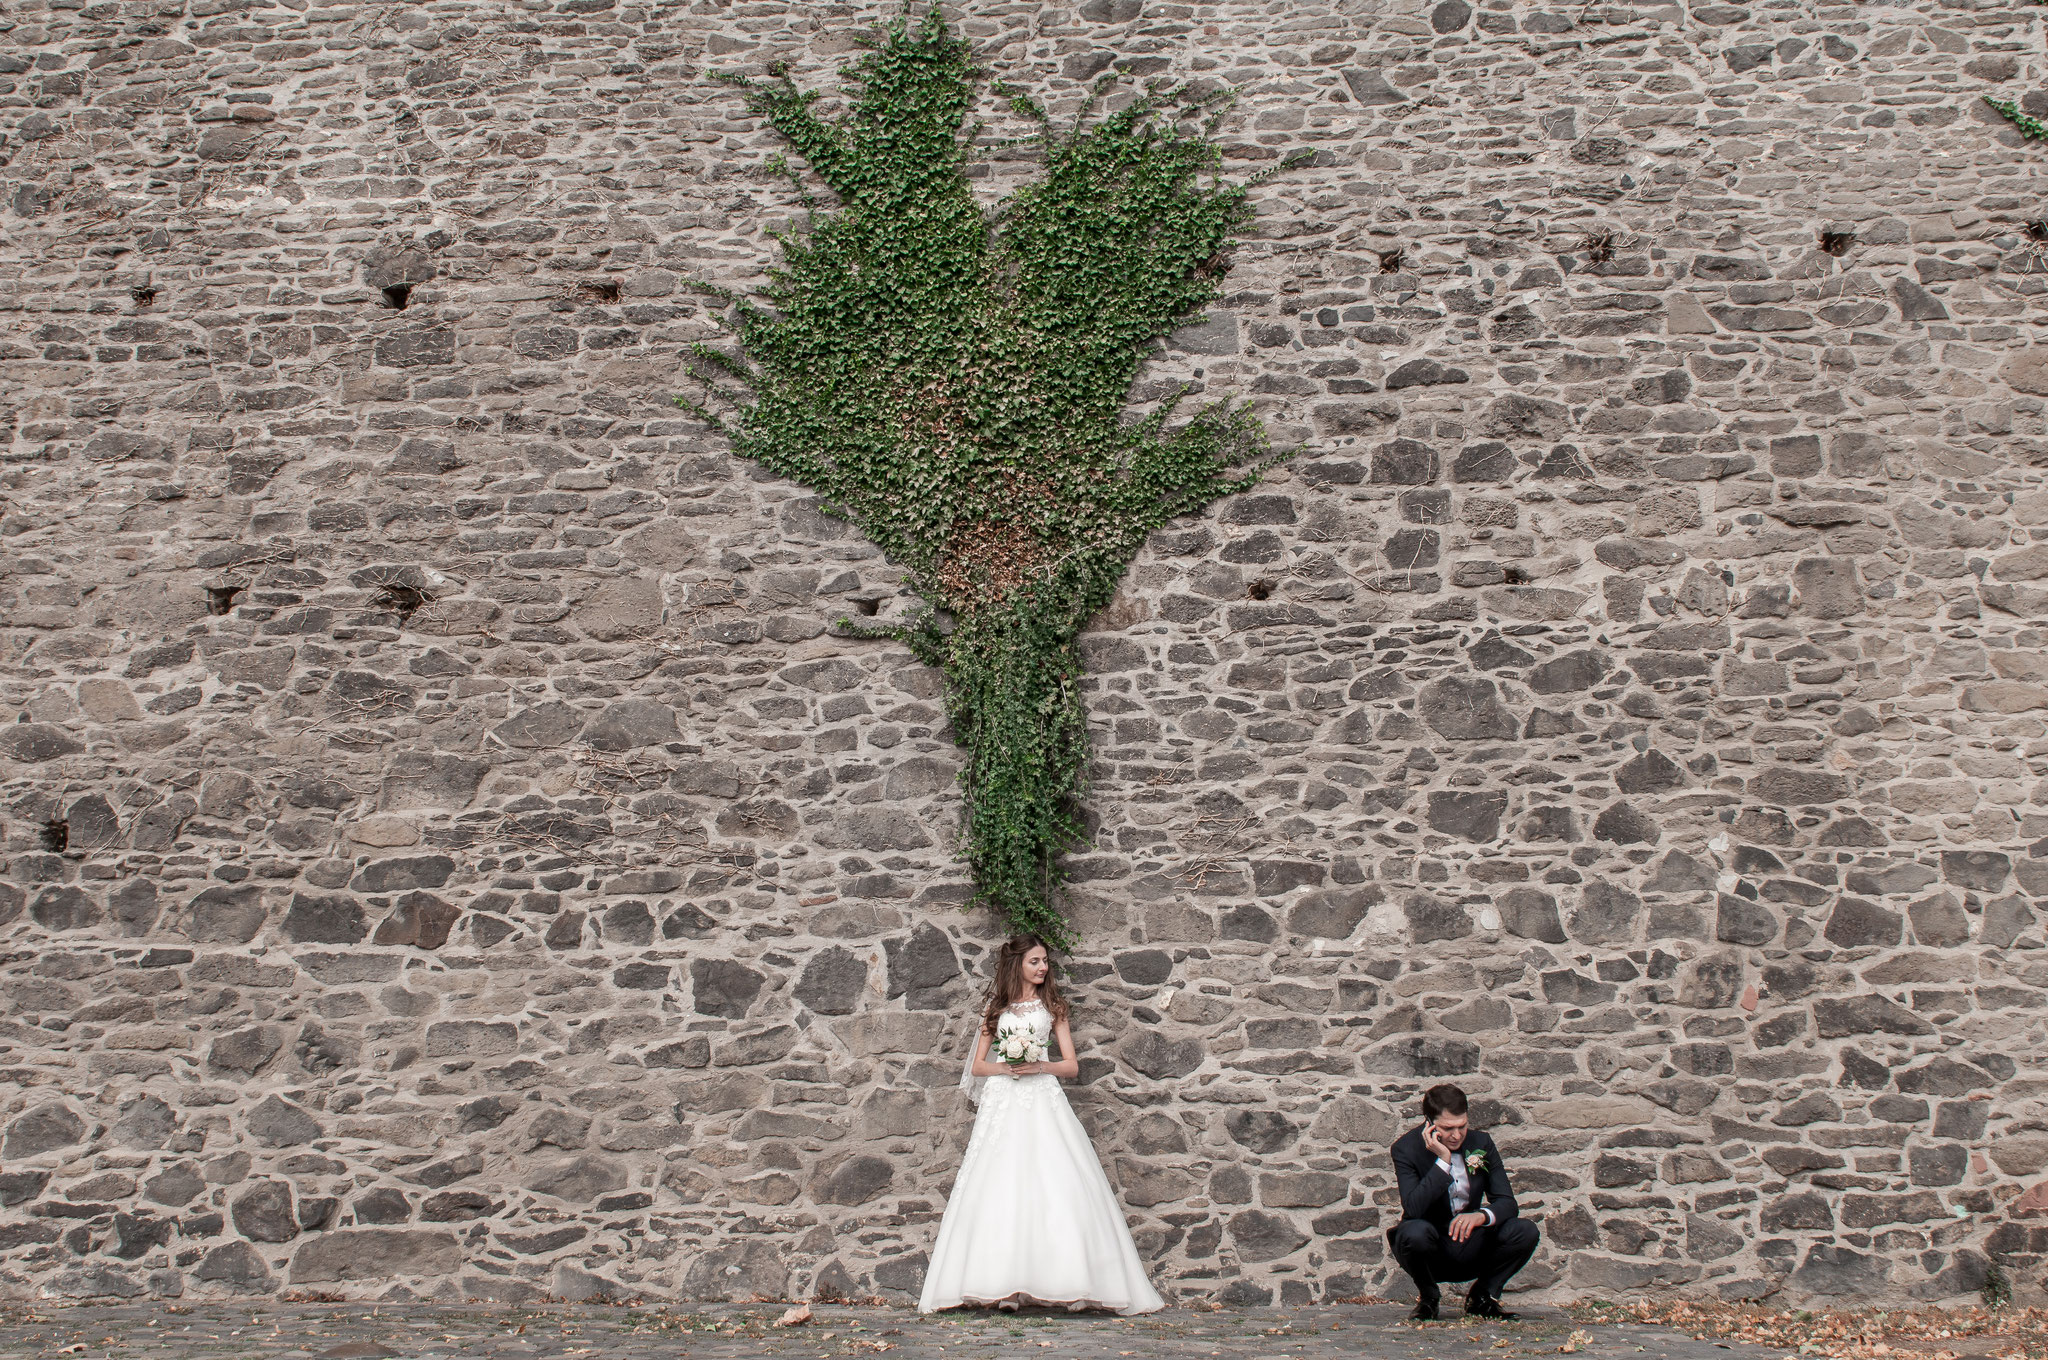 Ausnahmezustand bei dem Bräutigam - spontane Situation